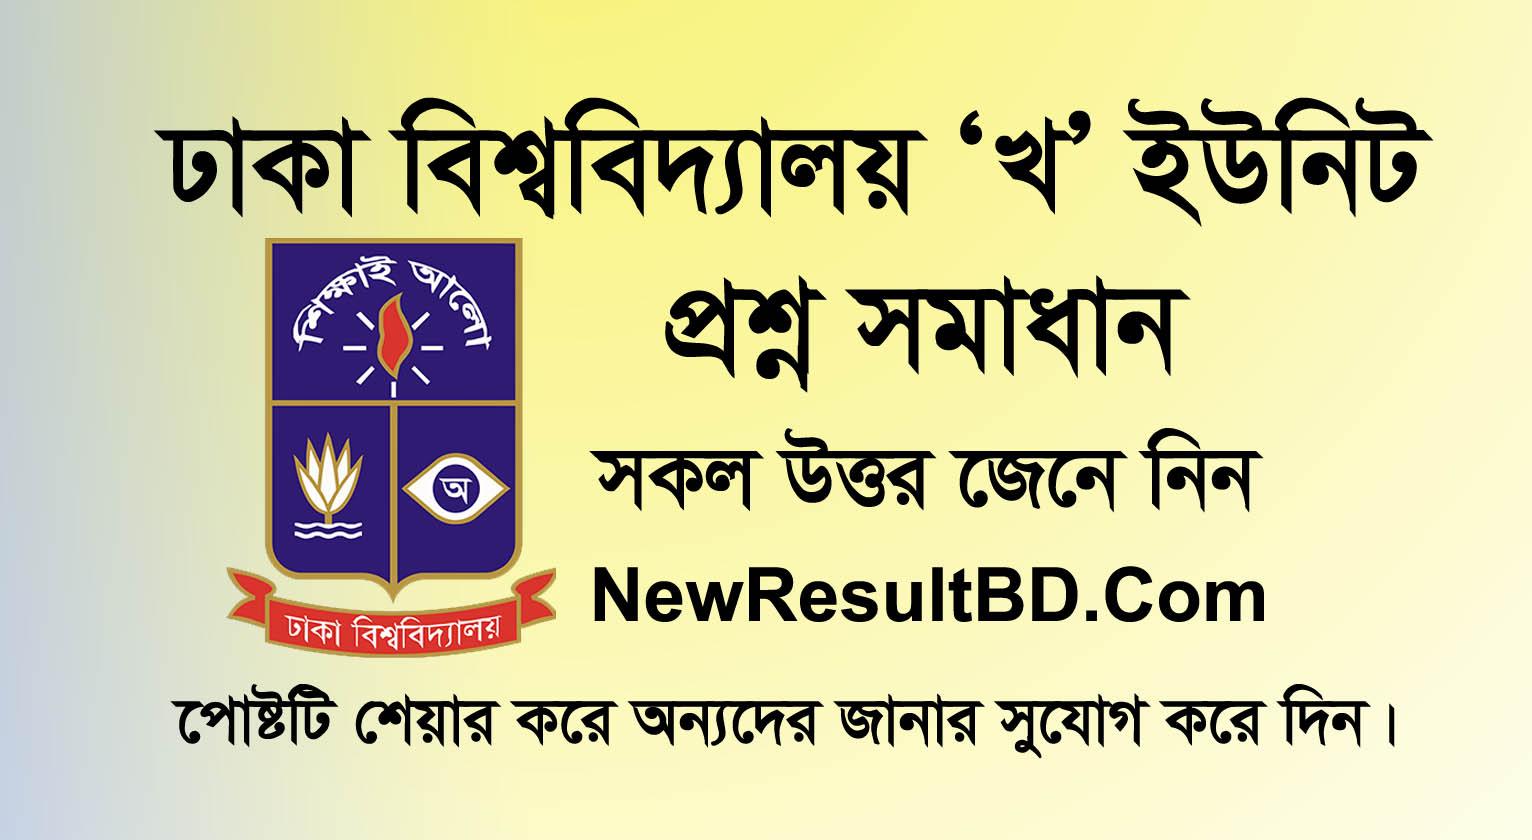 Dhaka University B Unit Question Solution 2019-20, DU B Unit Question Solve, Kha unit solutions, বি ইউনিট প্রশ্ন সমাধান ২০১৯, Dhaka Varsity B Unit Answers.